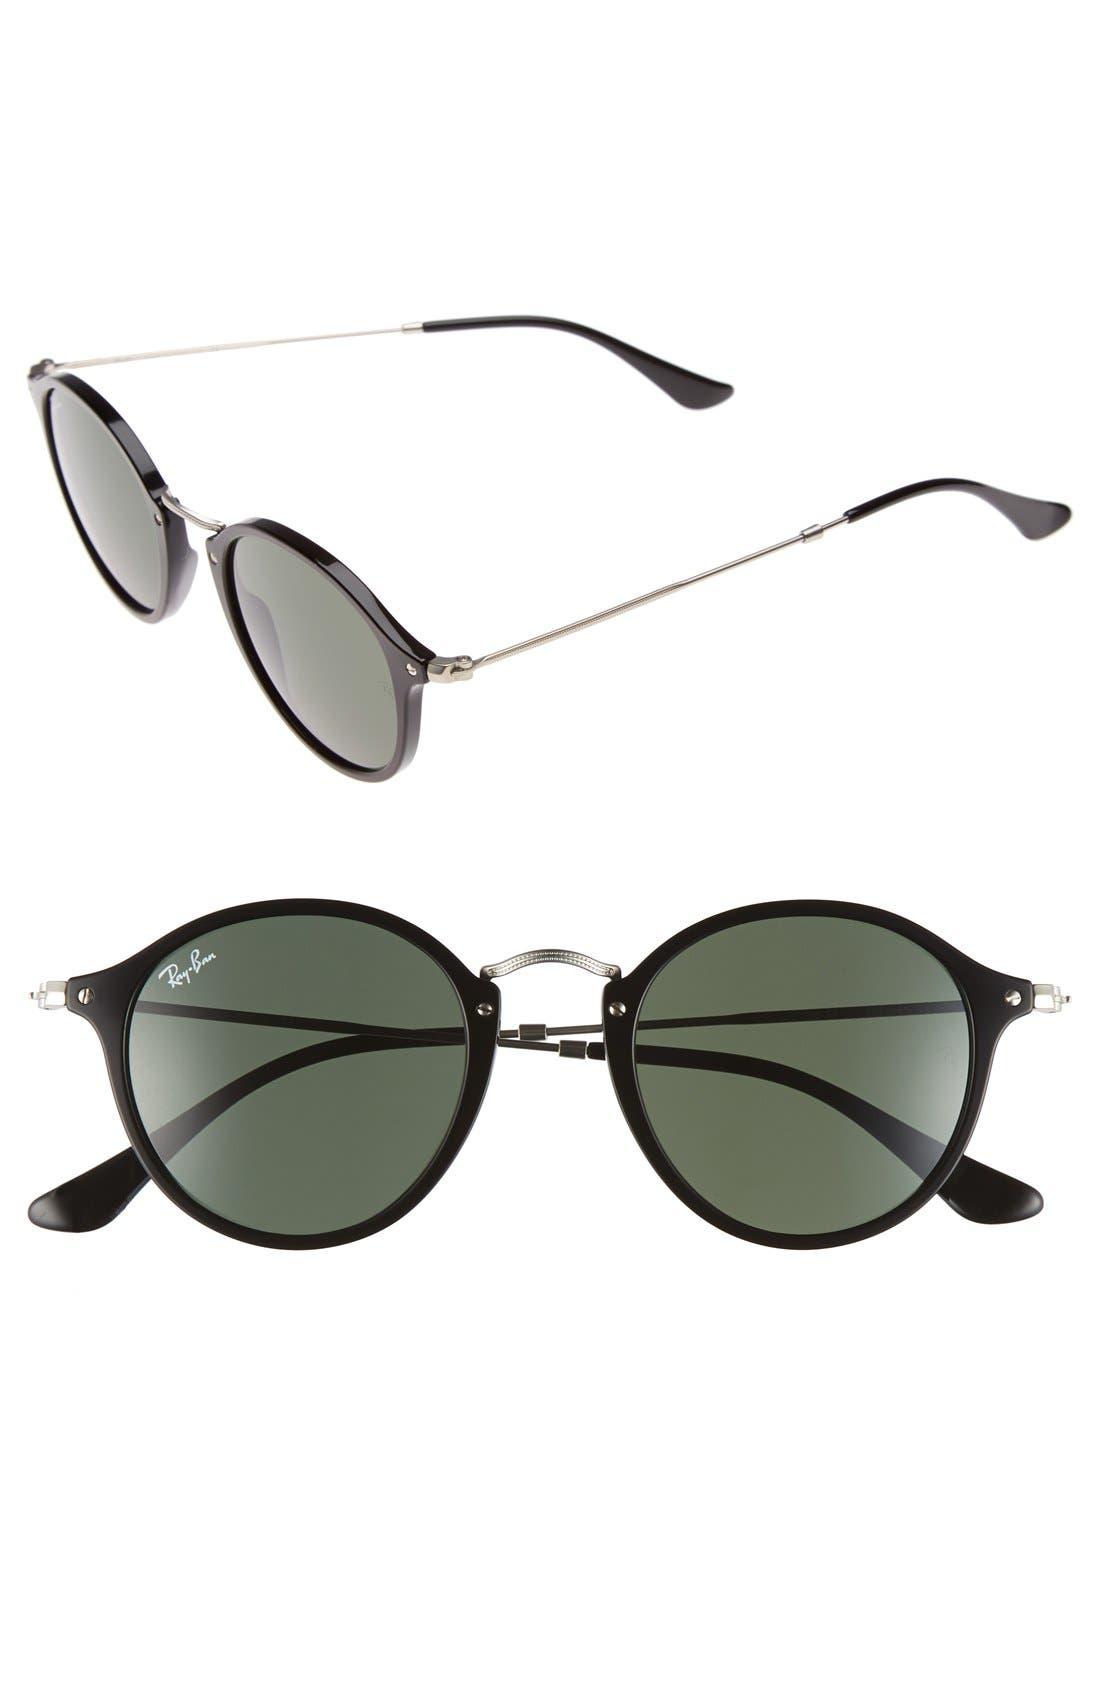 Ray-Ban 4m Retro Sunglasses - Black/ Green